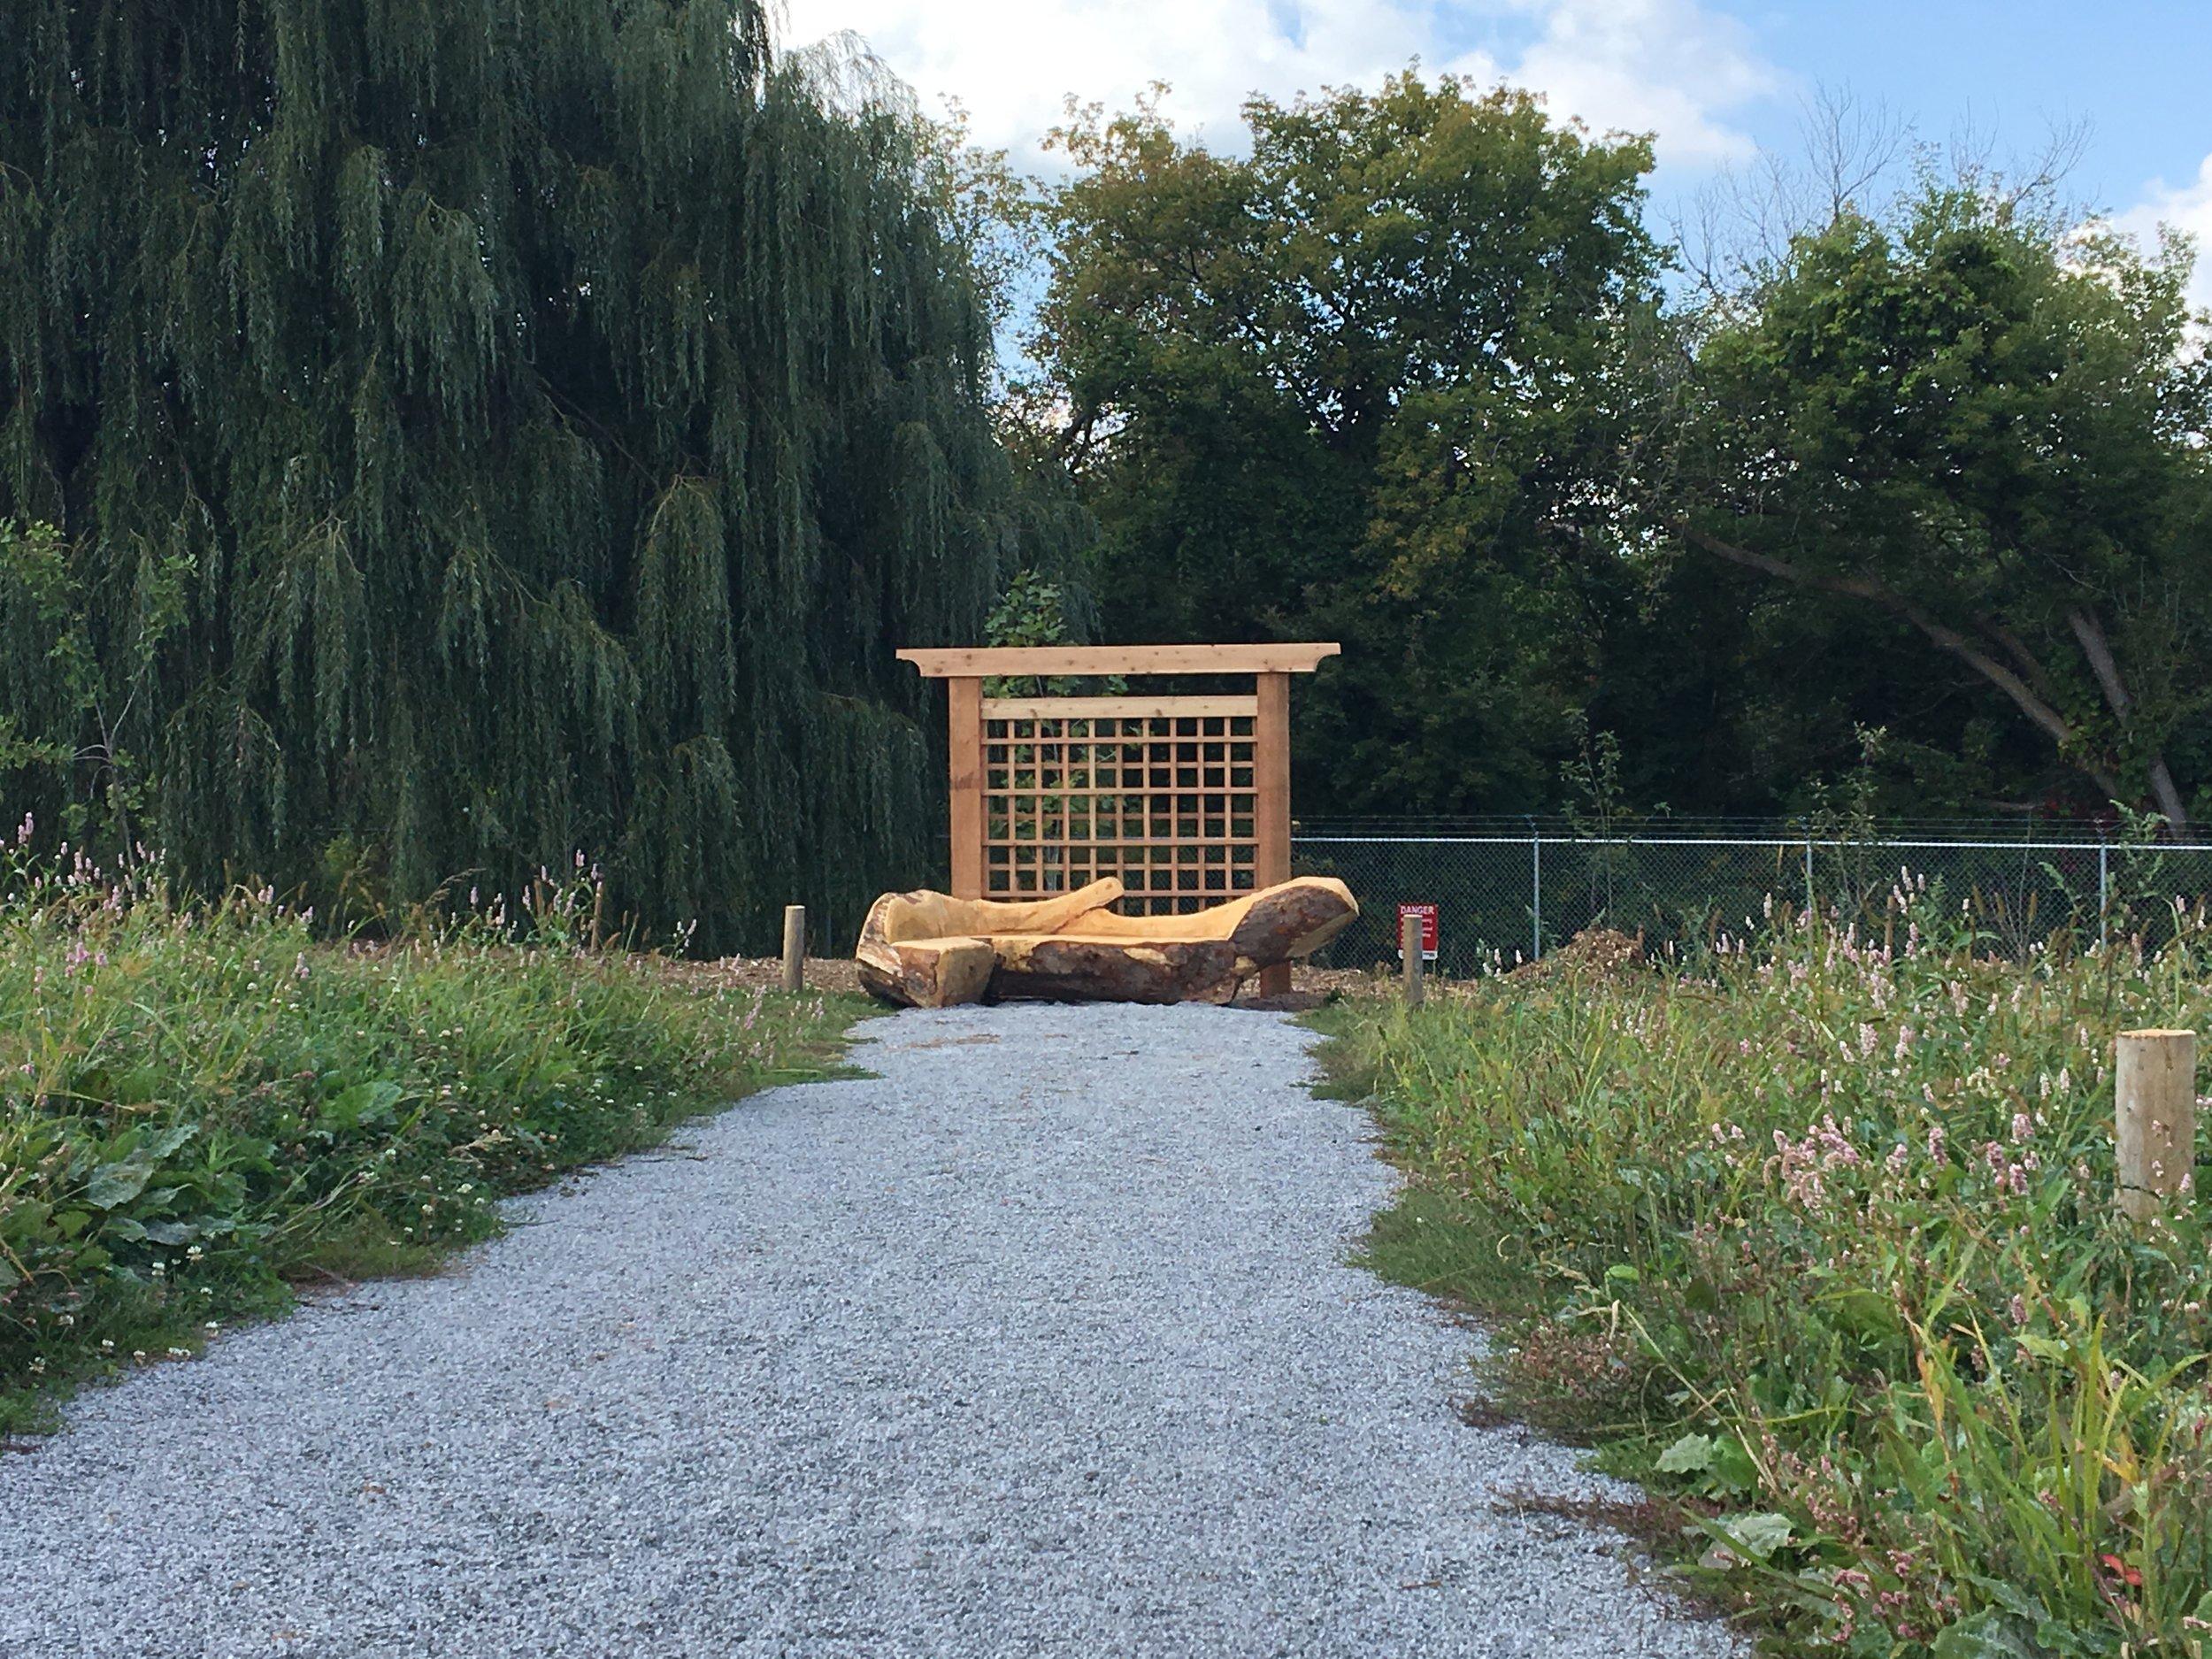 Willow's Rest at Niagara Falls, Ontario